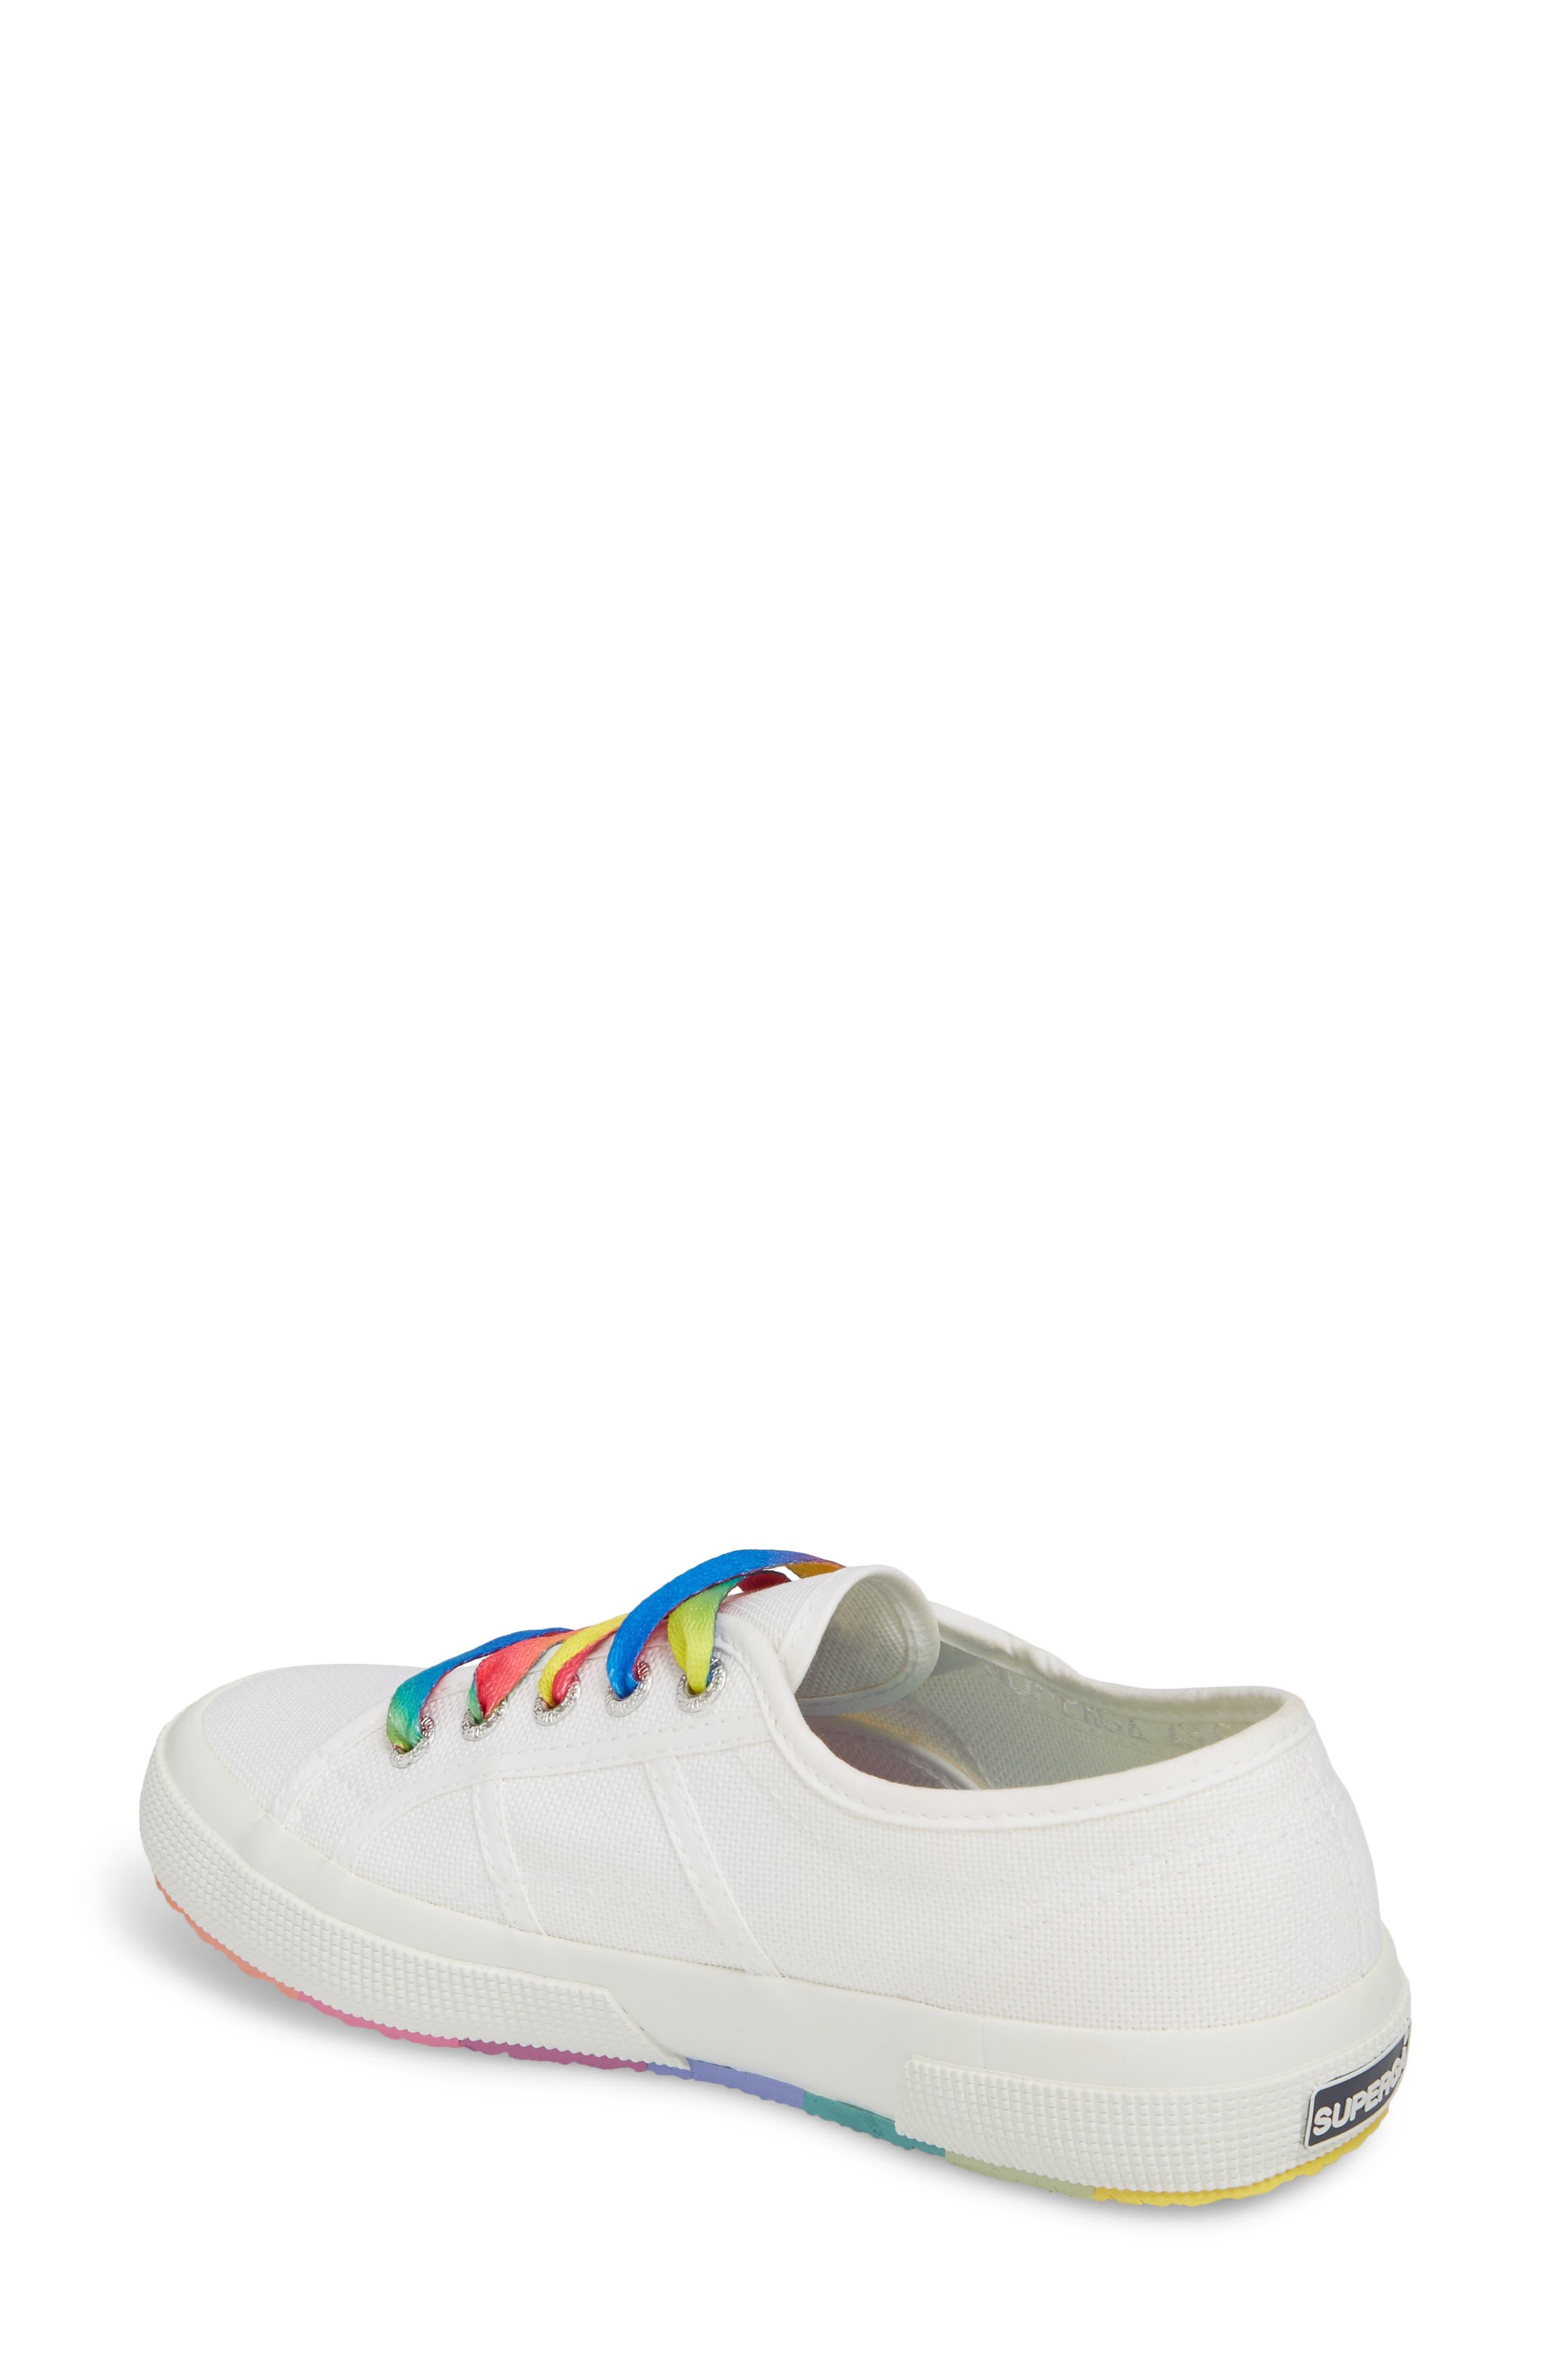 2750 Multicolor Sneaker,                             Alternate thumbnail 2, color,